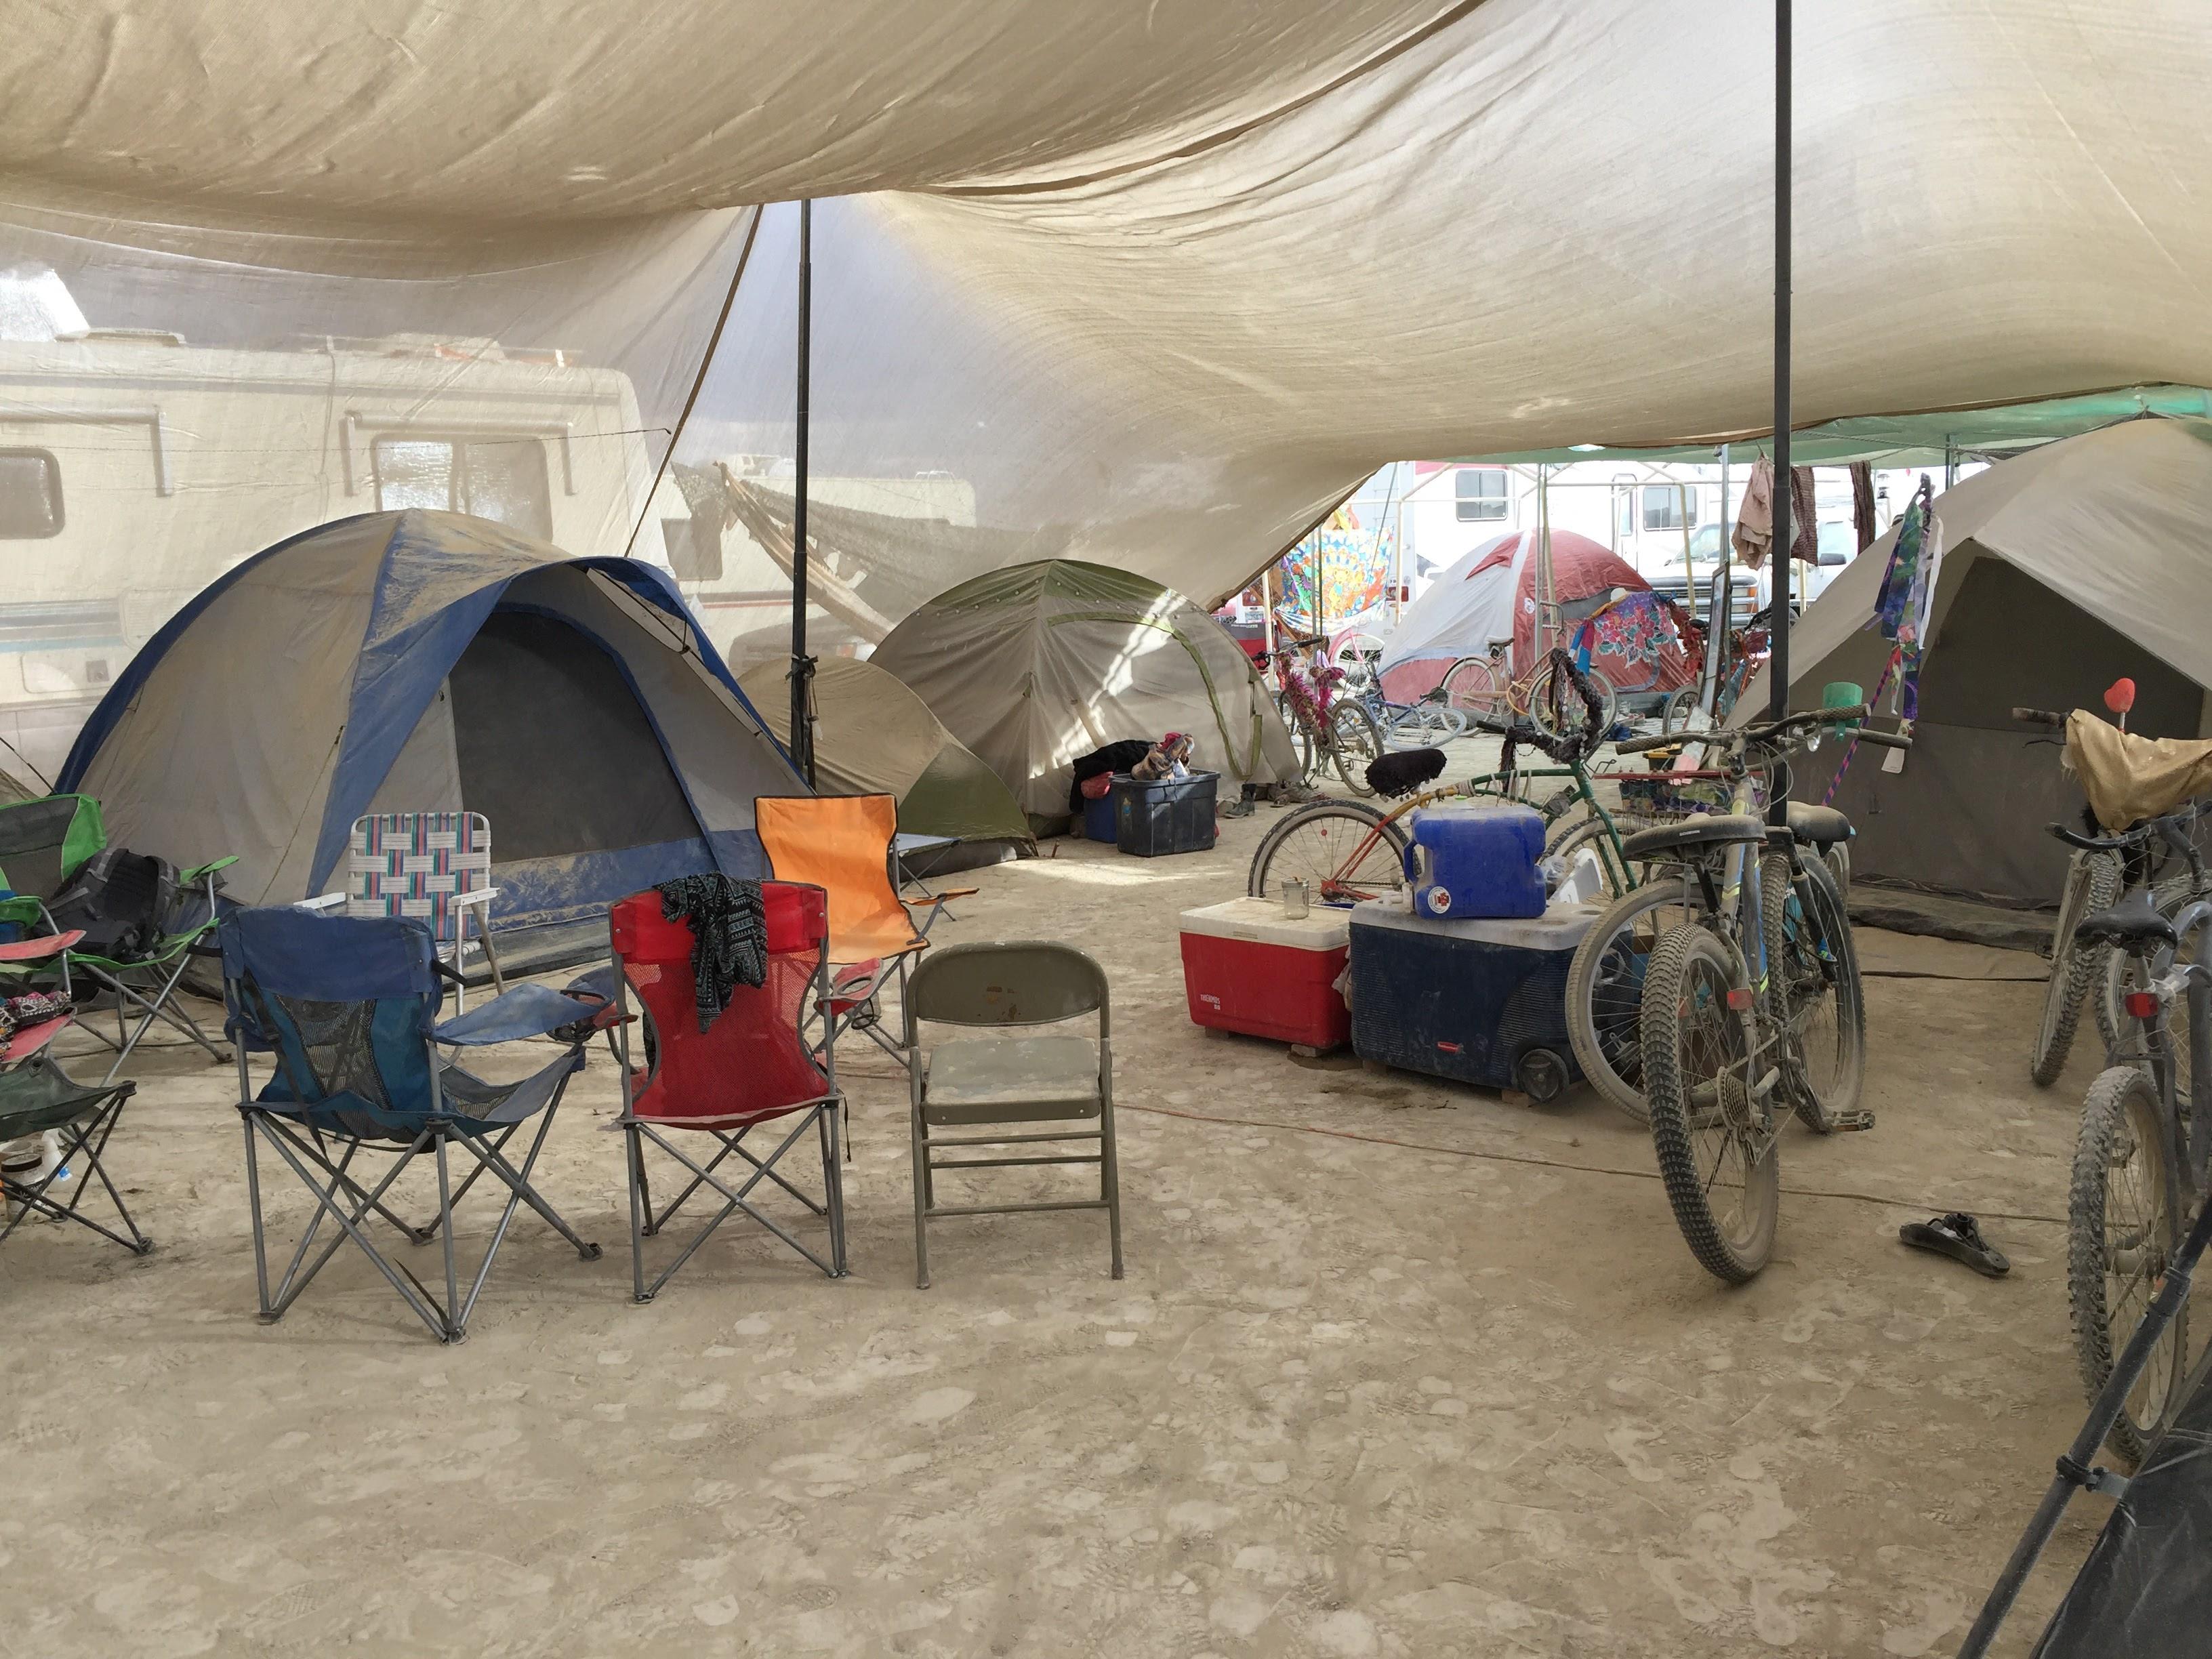 Tent Village